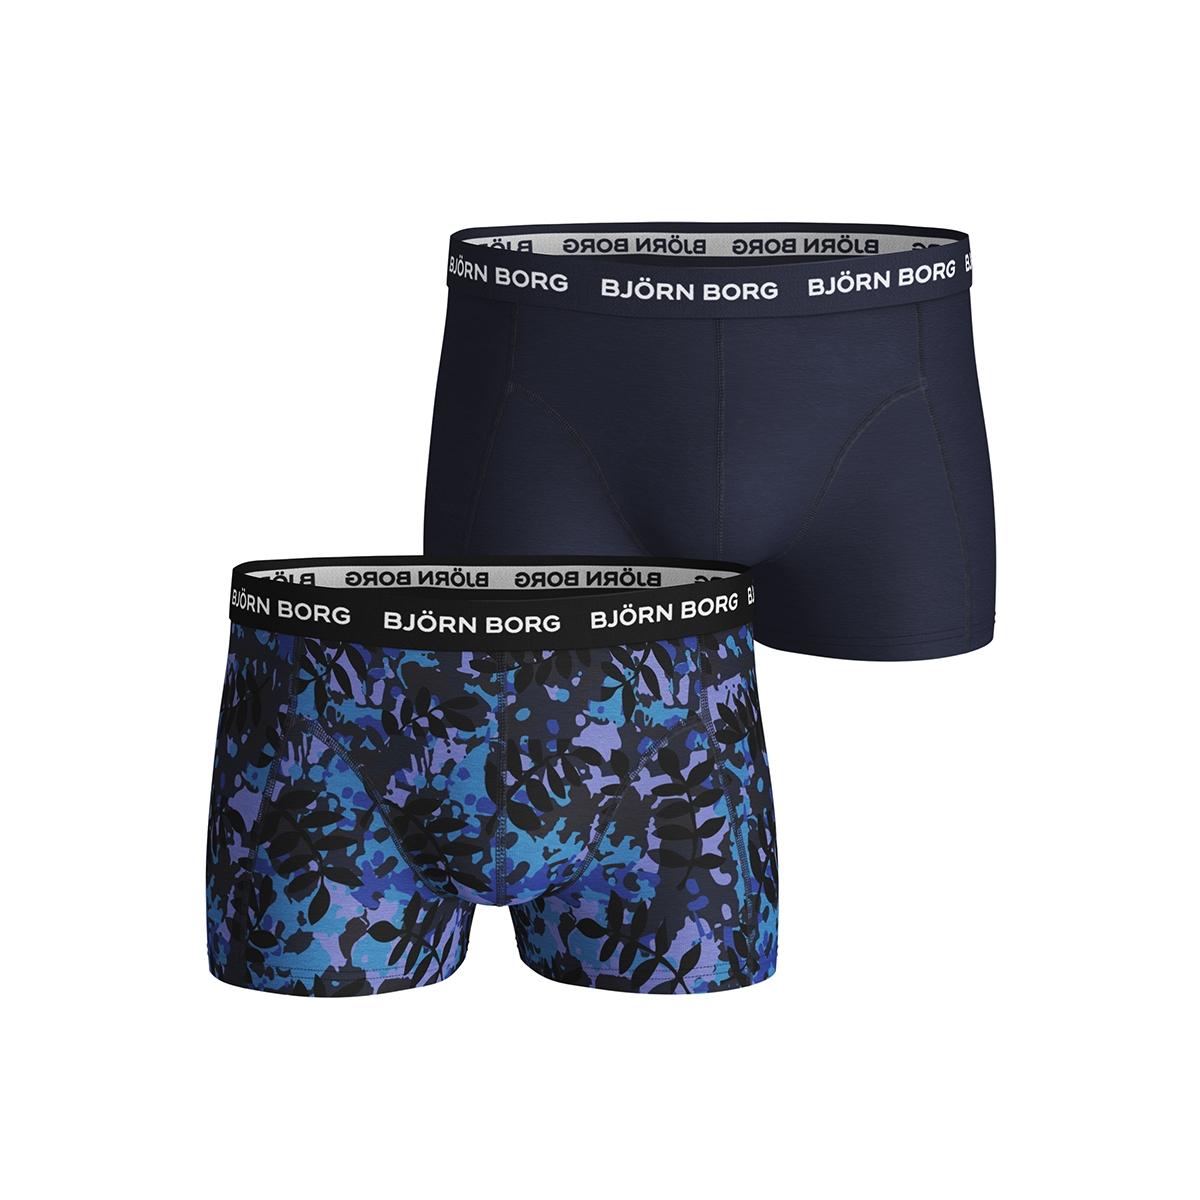 short shorts scot 1941 1120 bjorn borg ondergoed 70011 peacoat